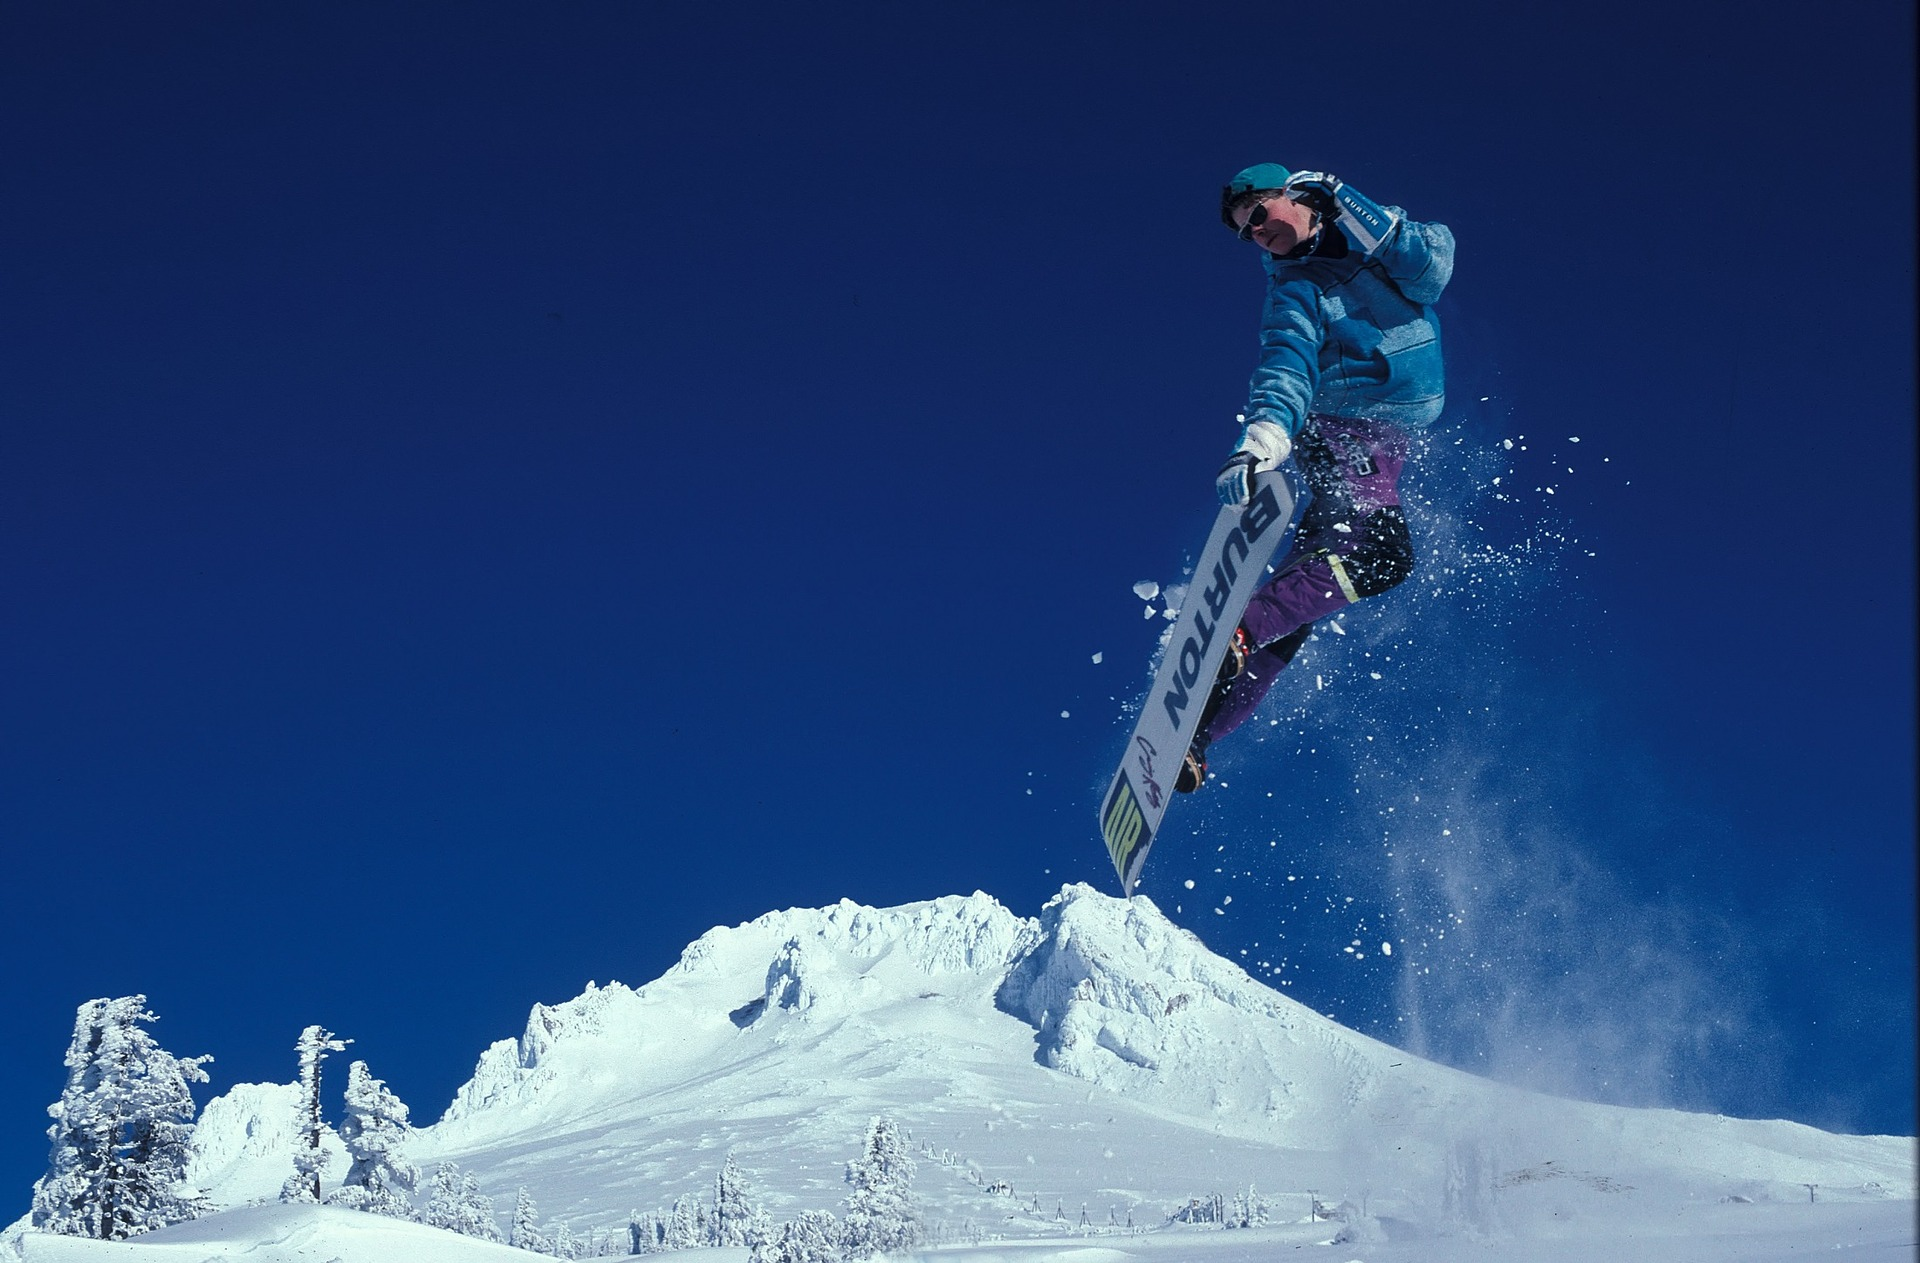 Renåfjellet Snowboard